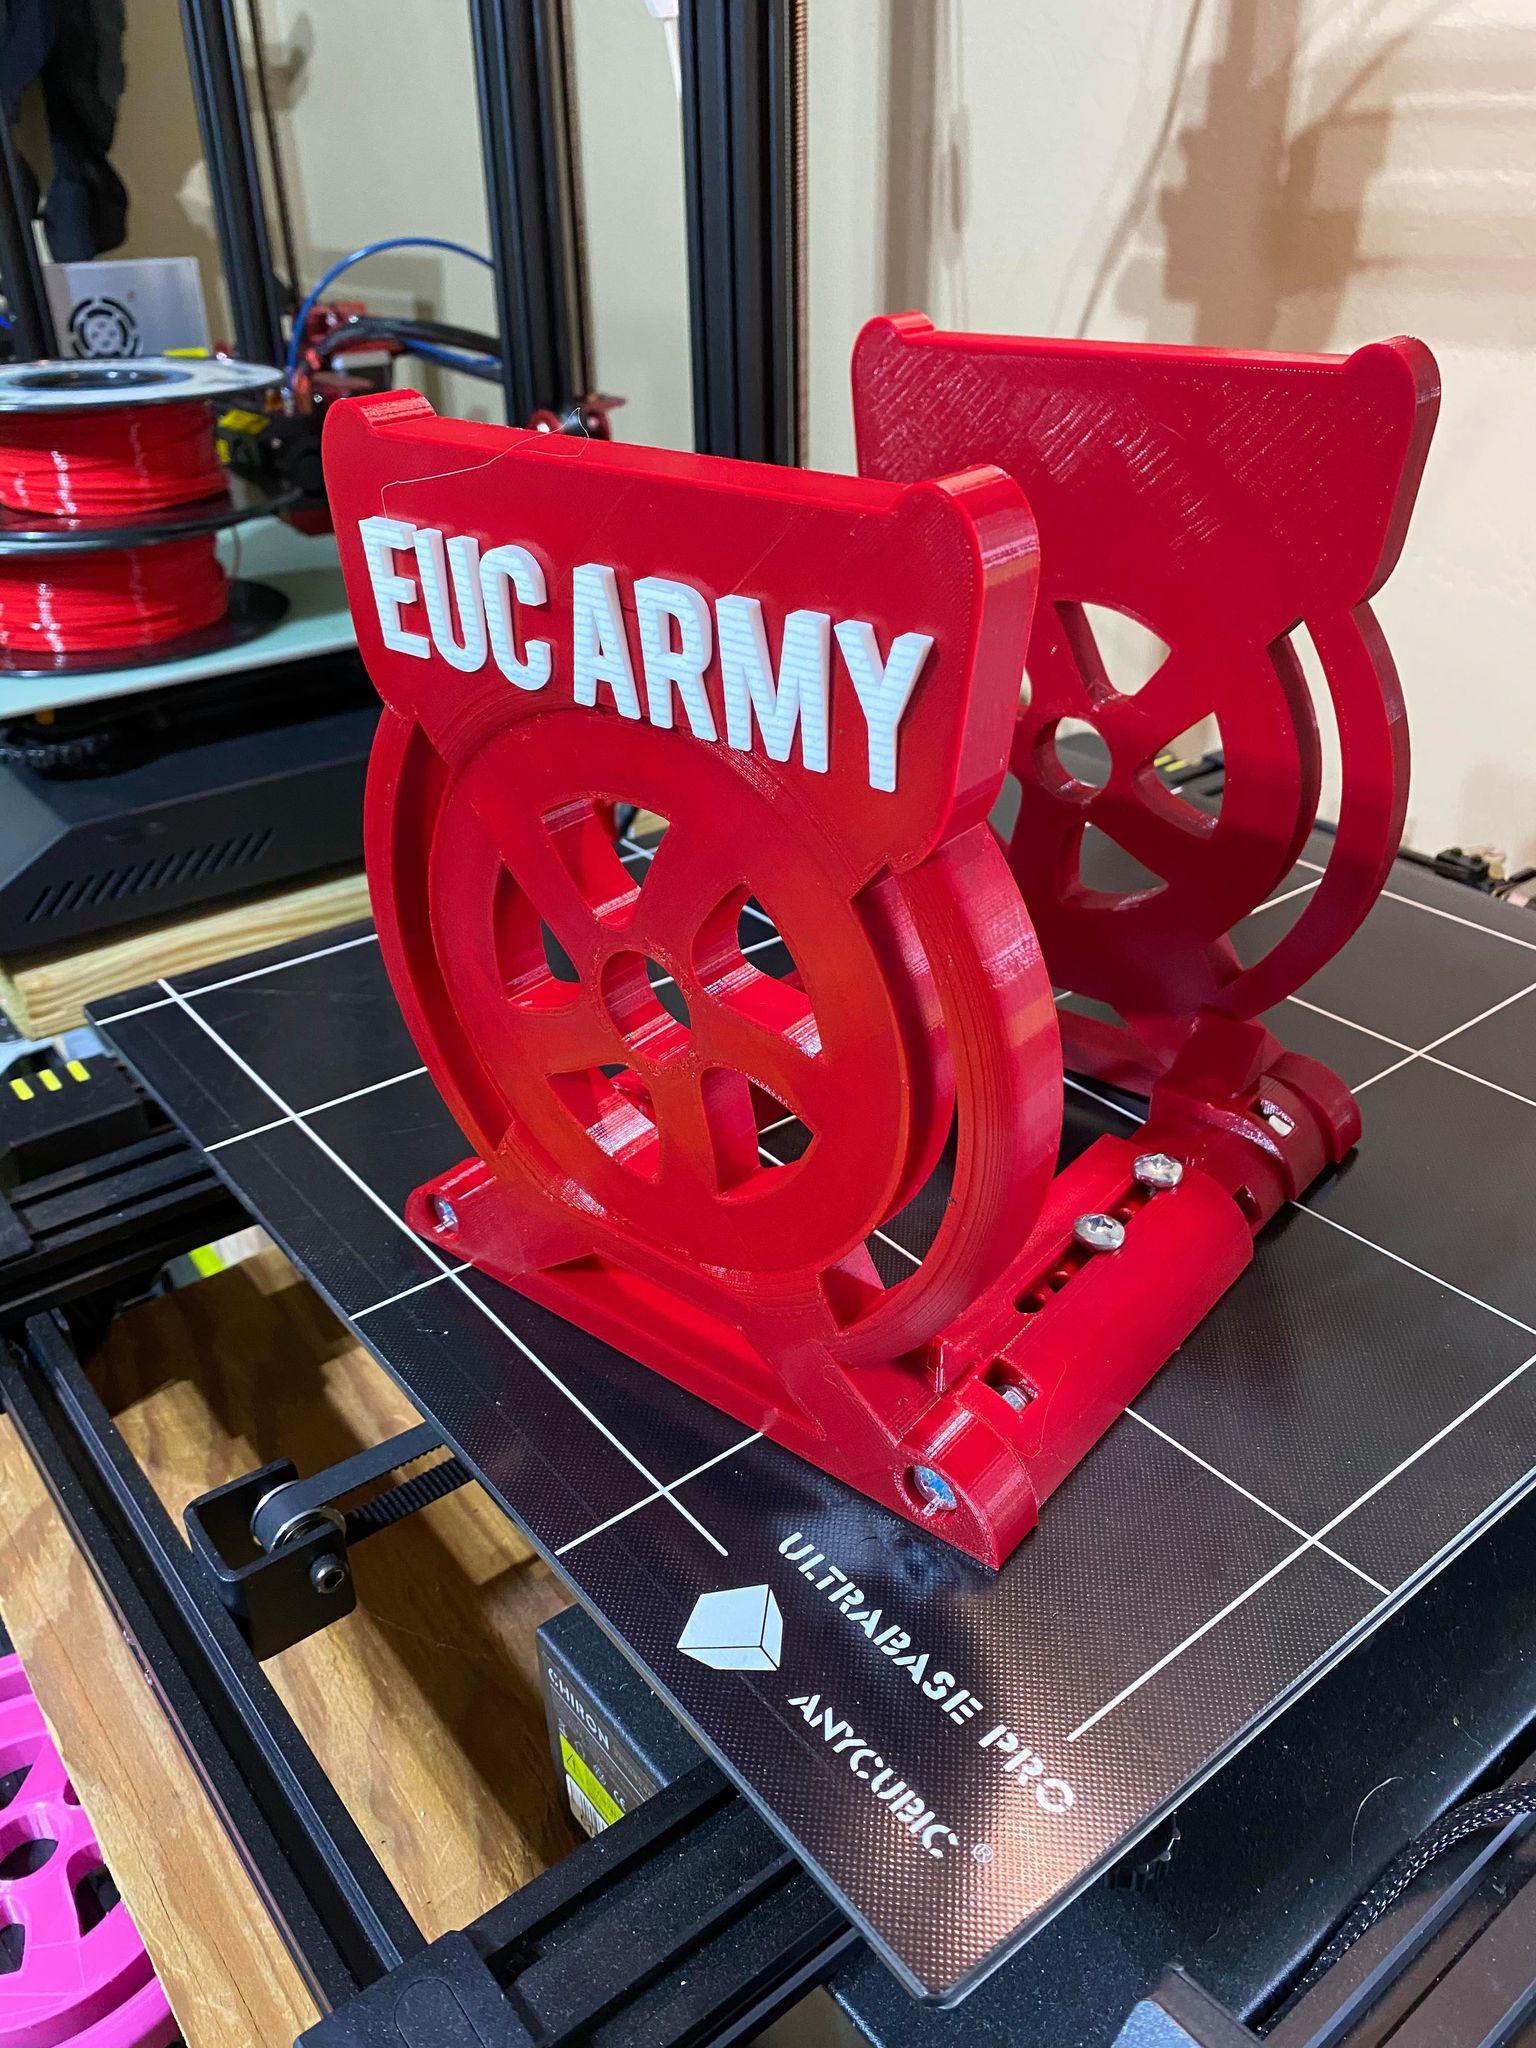 EUC Stand 3.9 Premium Tall Boy Adjustable - Fits ALL wheels